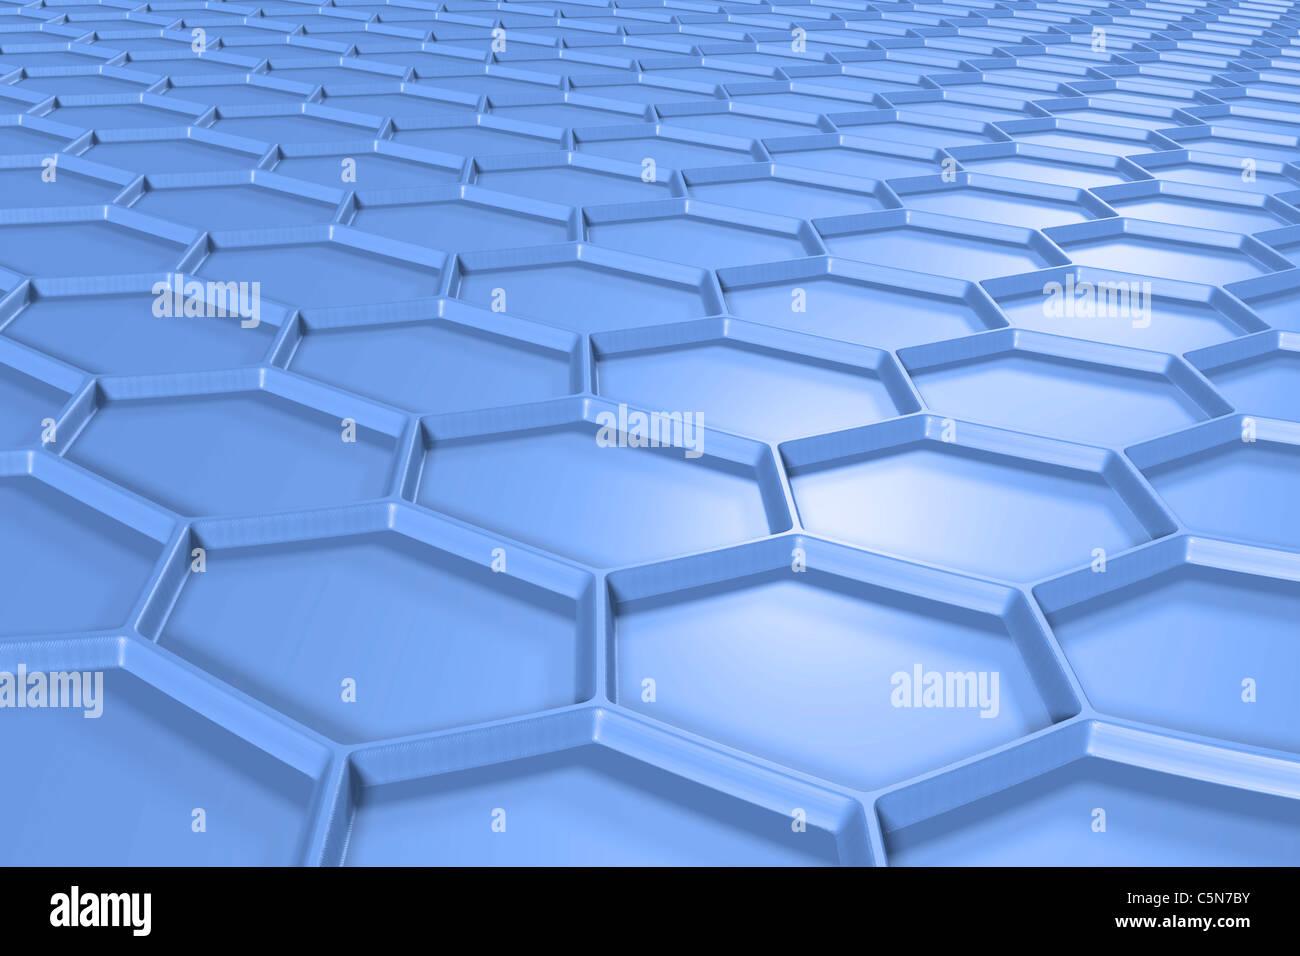 Blu struttura esagonale. Immagini Stock